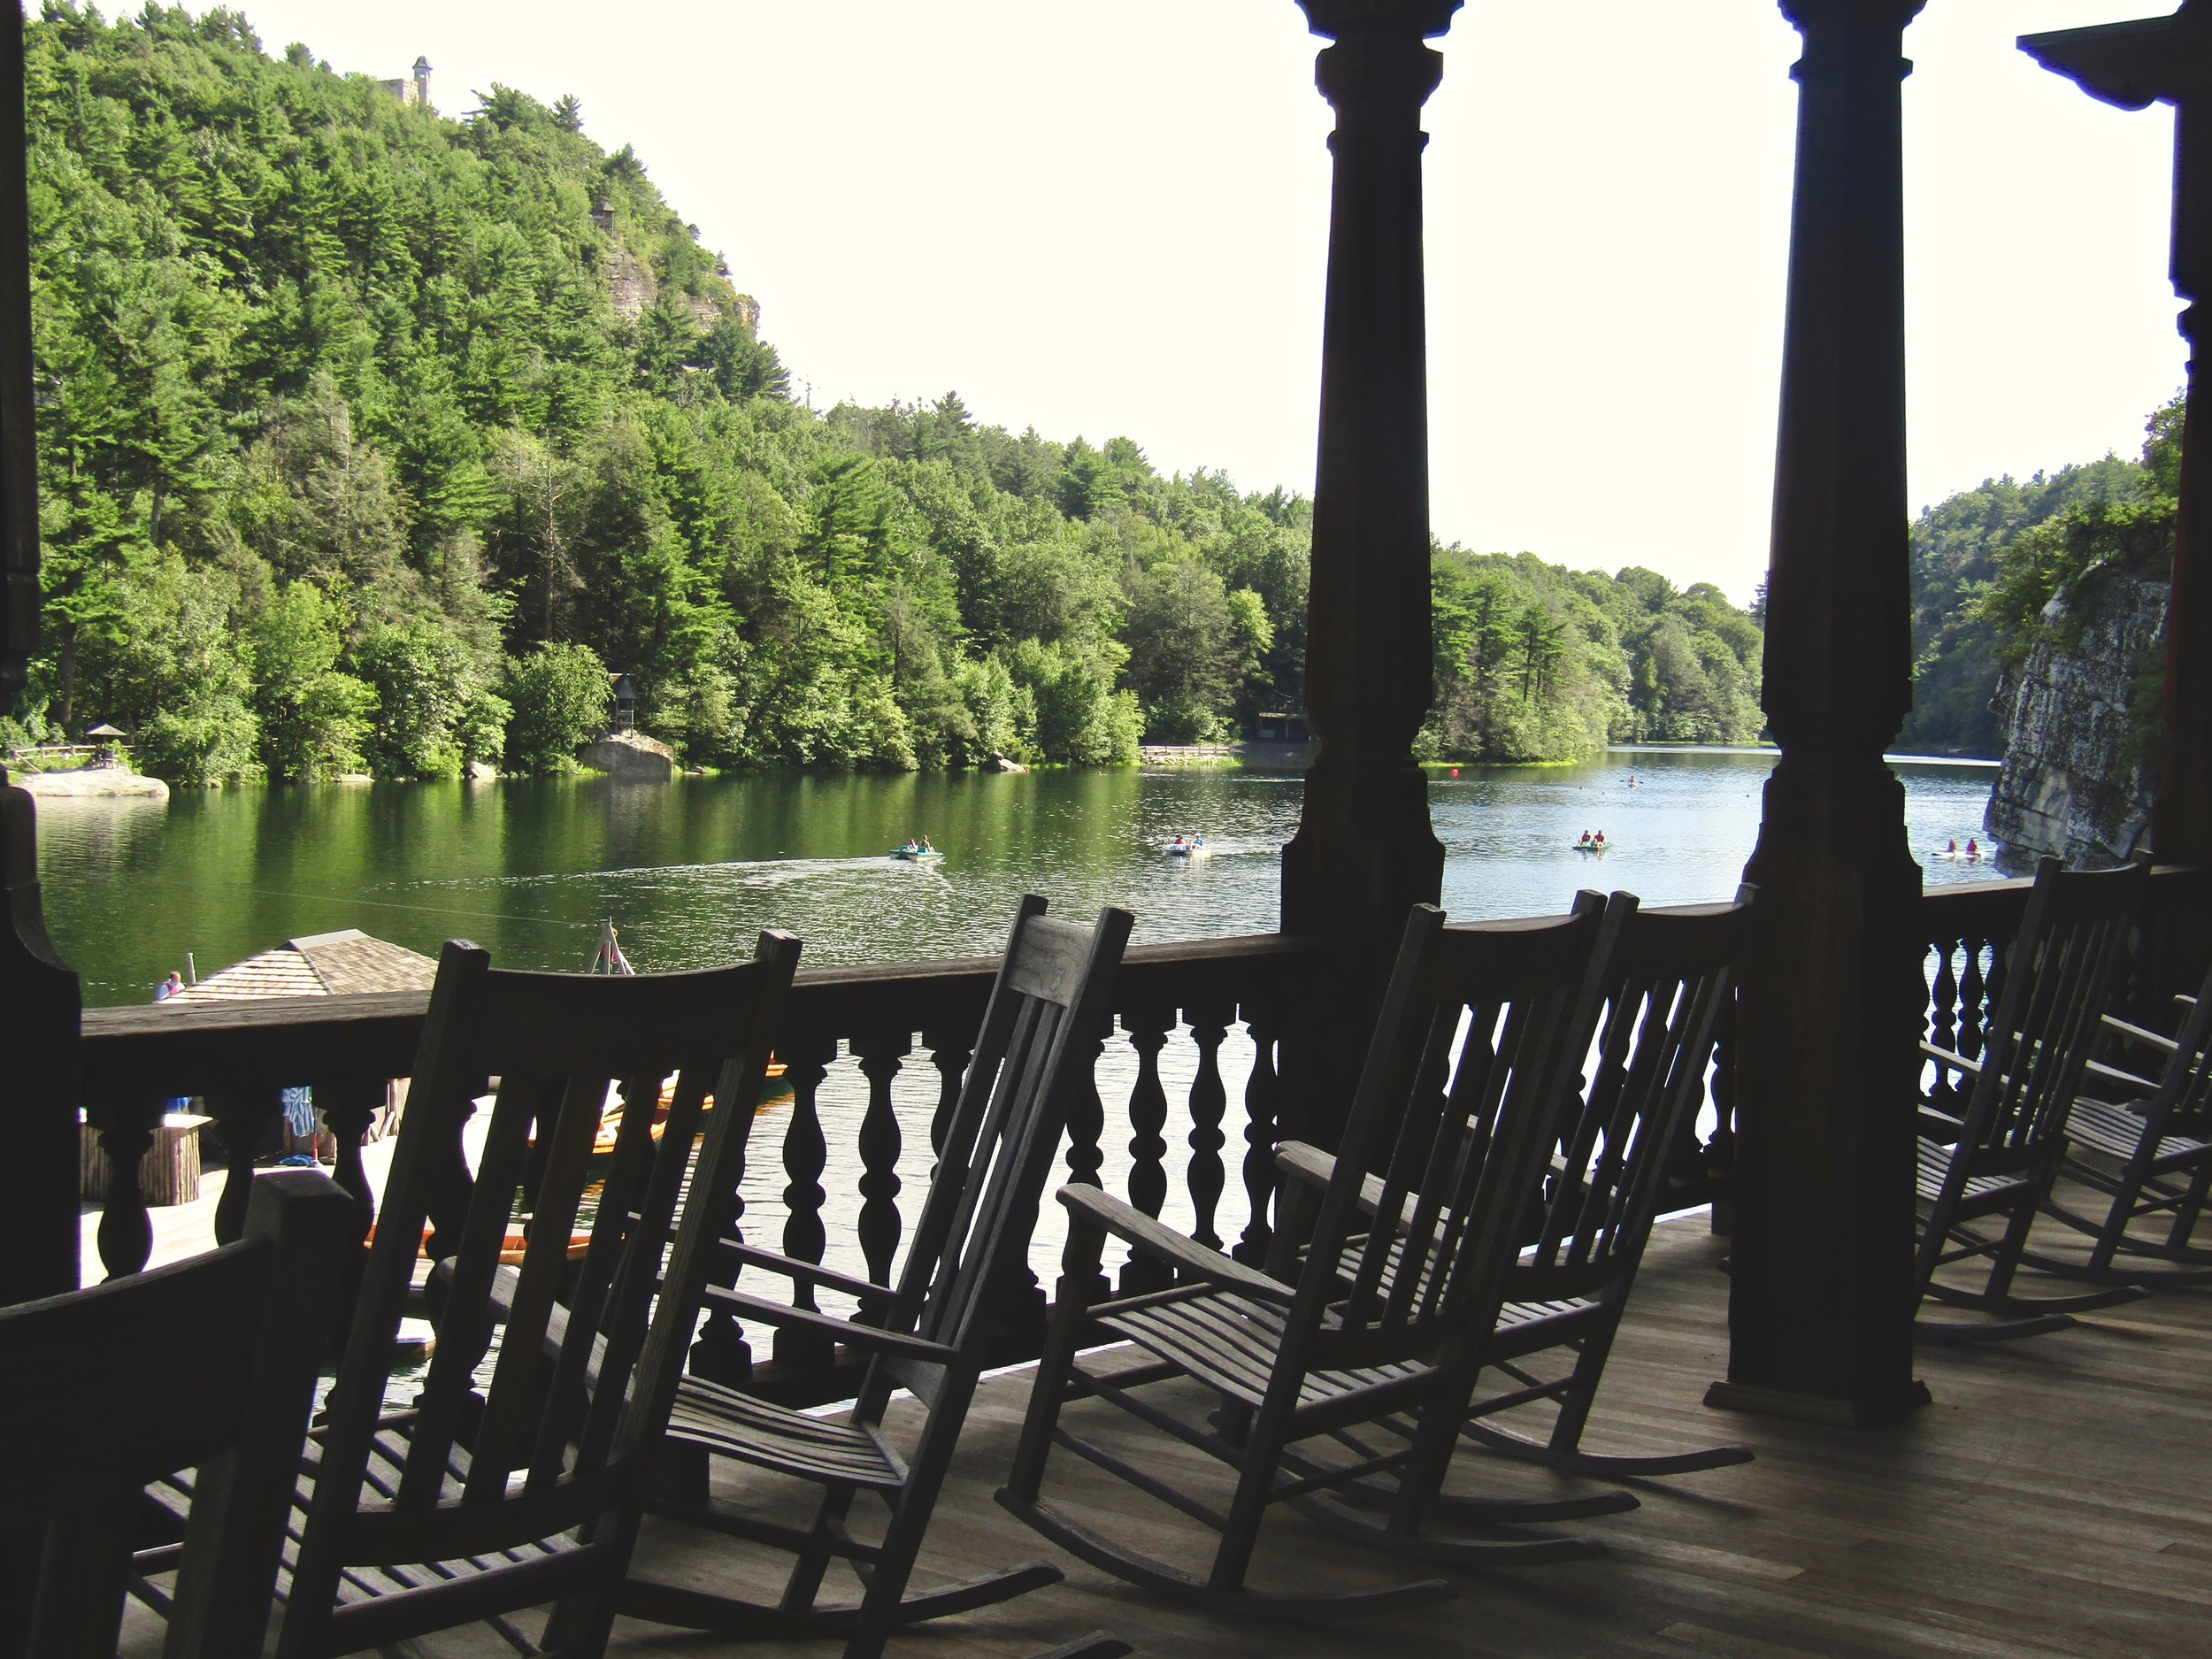 Rocking chairs overlooking Mohonk Lake. (Koehler photo)